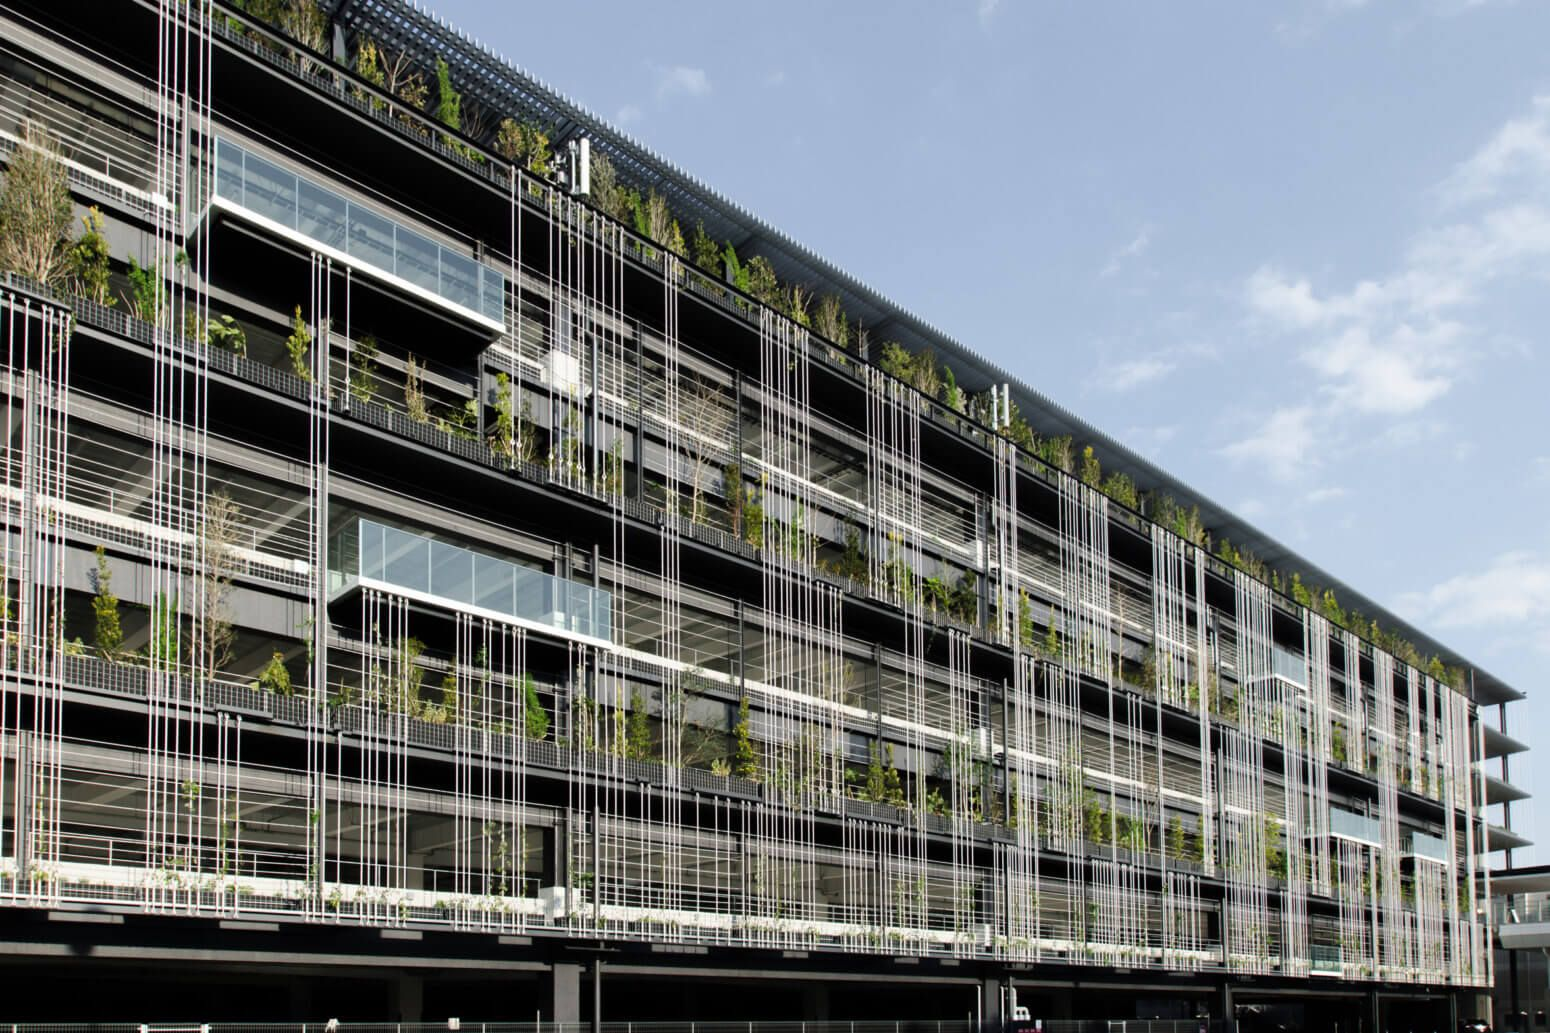 Stgk Inc ランドスケープデザイン ひとが暮らす風景を作る ランドスケープデザイン 緑のファサード 緑の建築